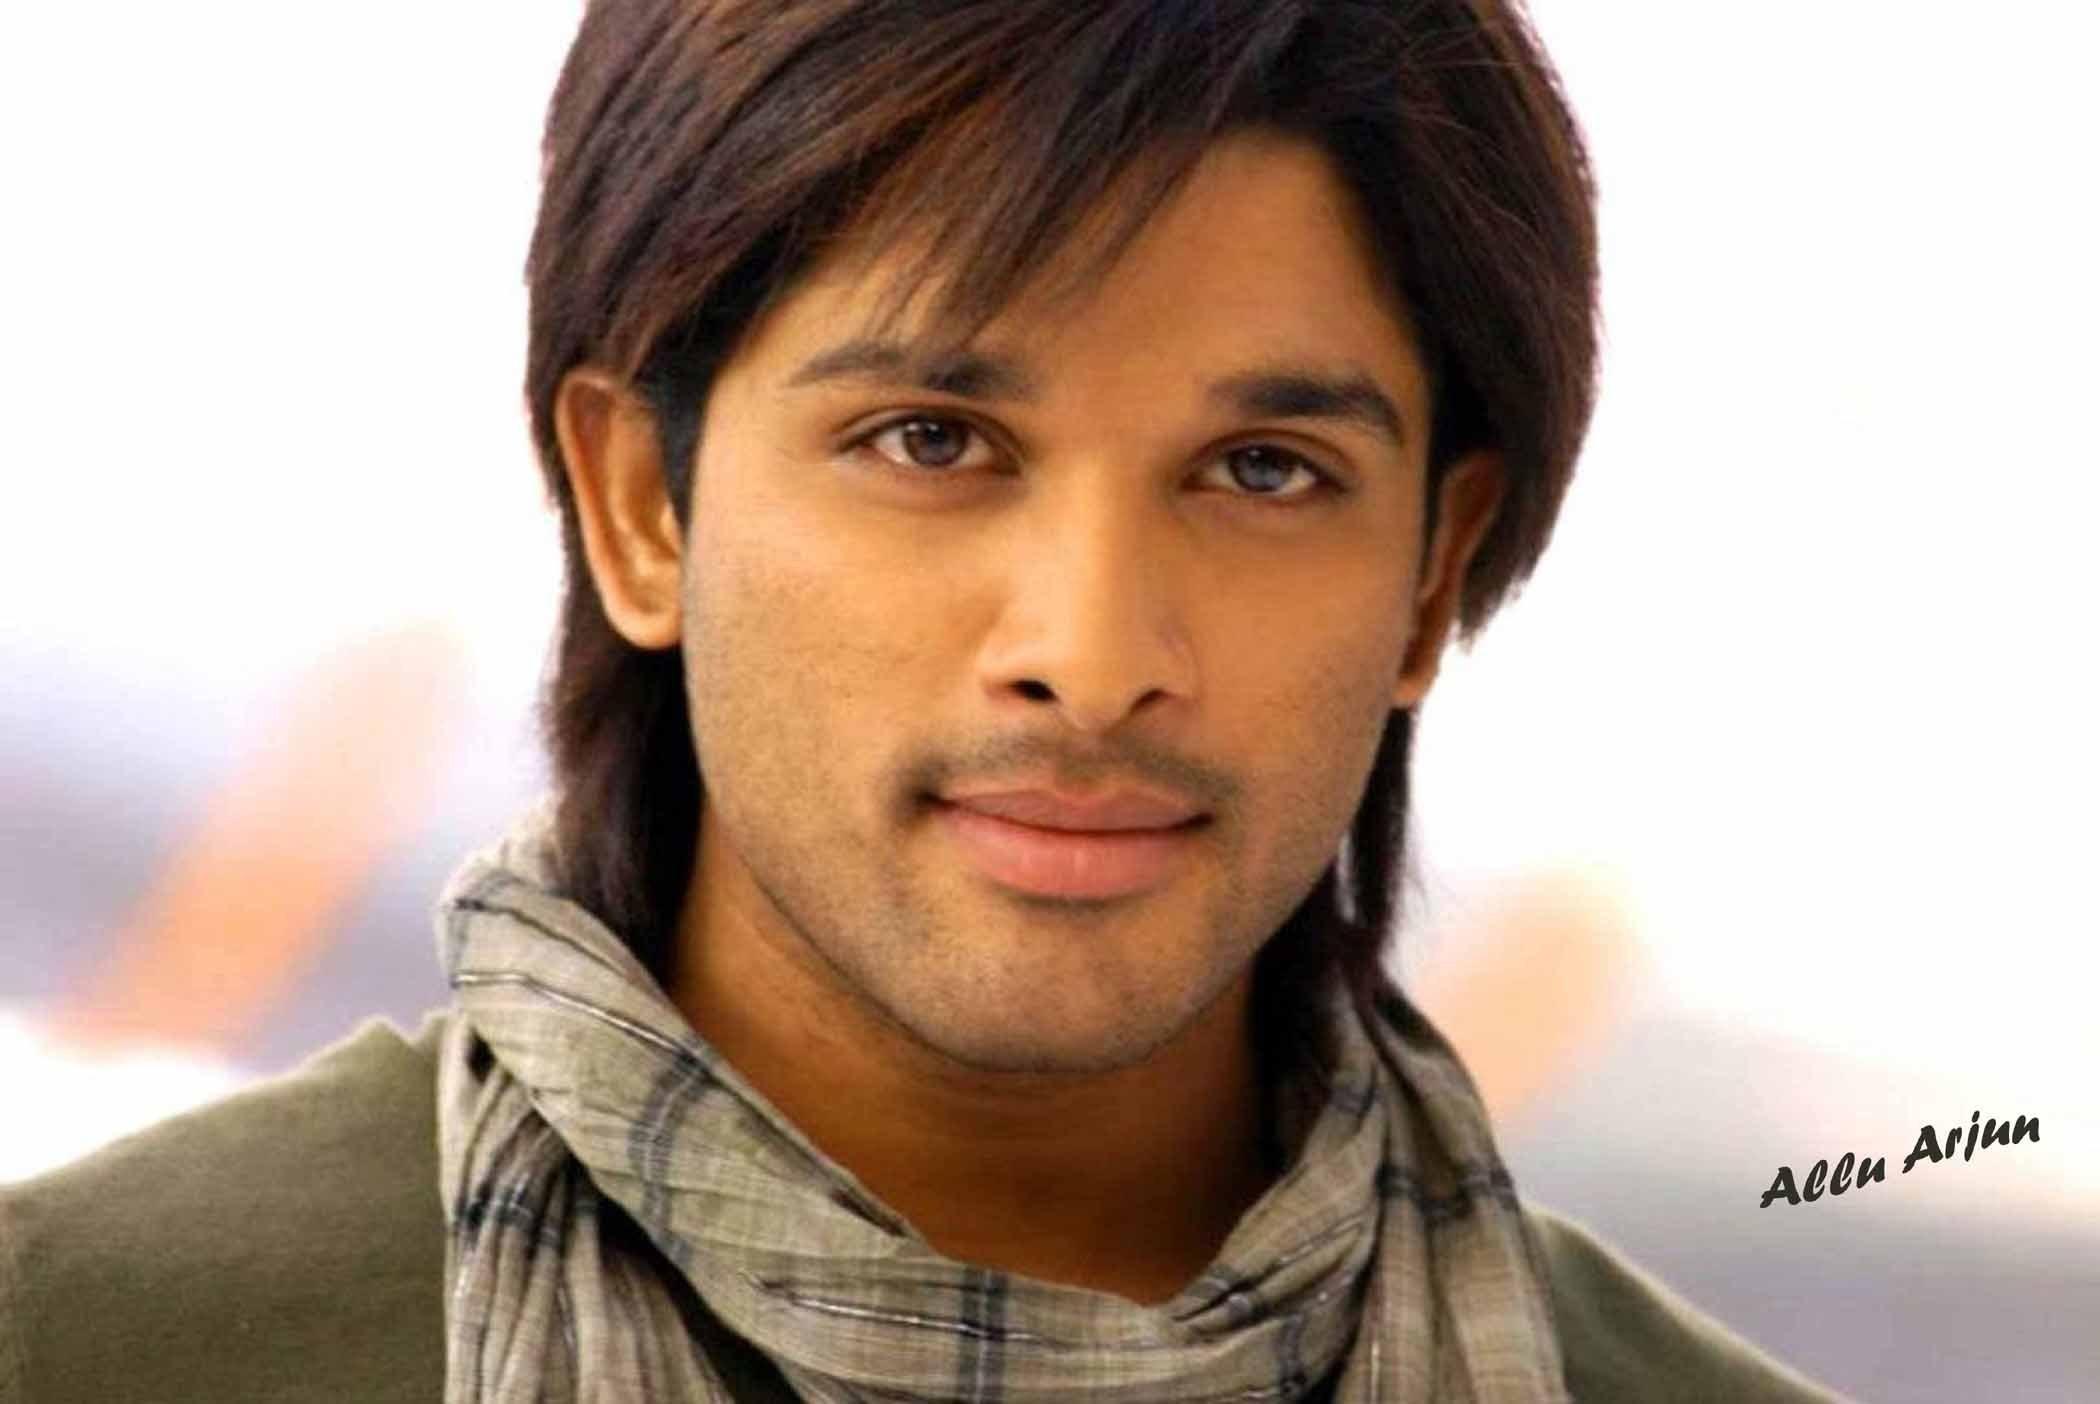 Allu Arjun In Arya 2 Hd Wallpapers Cute Allu Arjun Male 2100x1404 Download Hd Wallpaper Wallpapertip